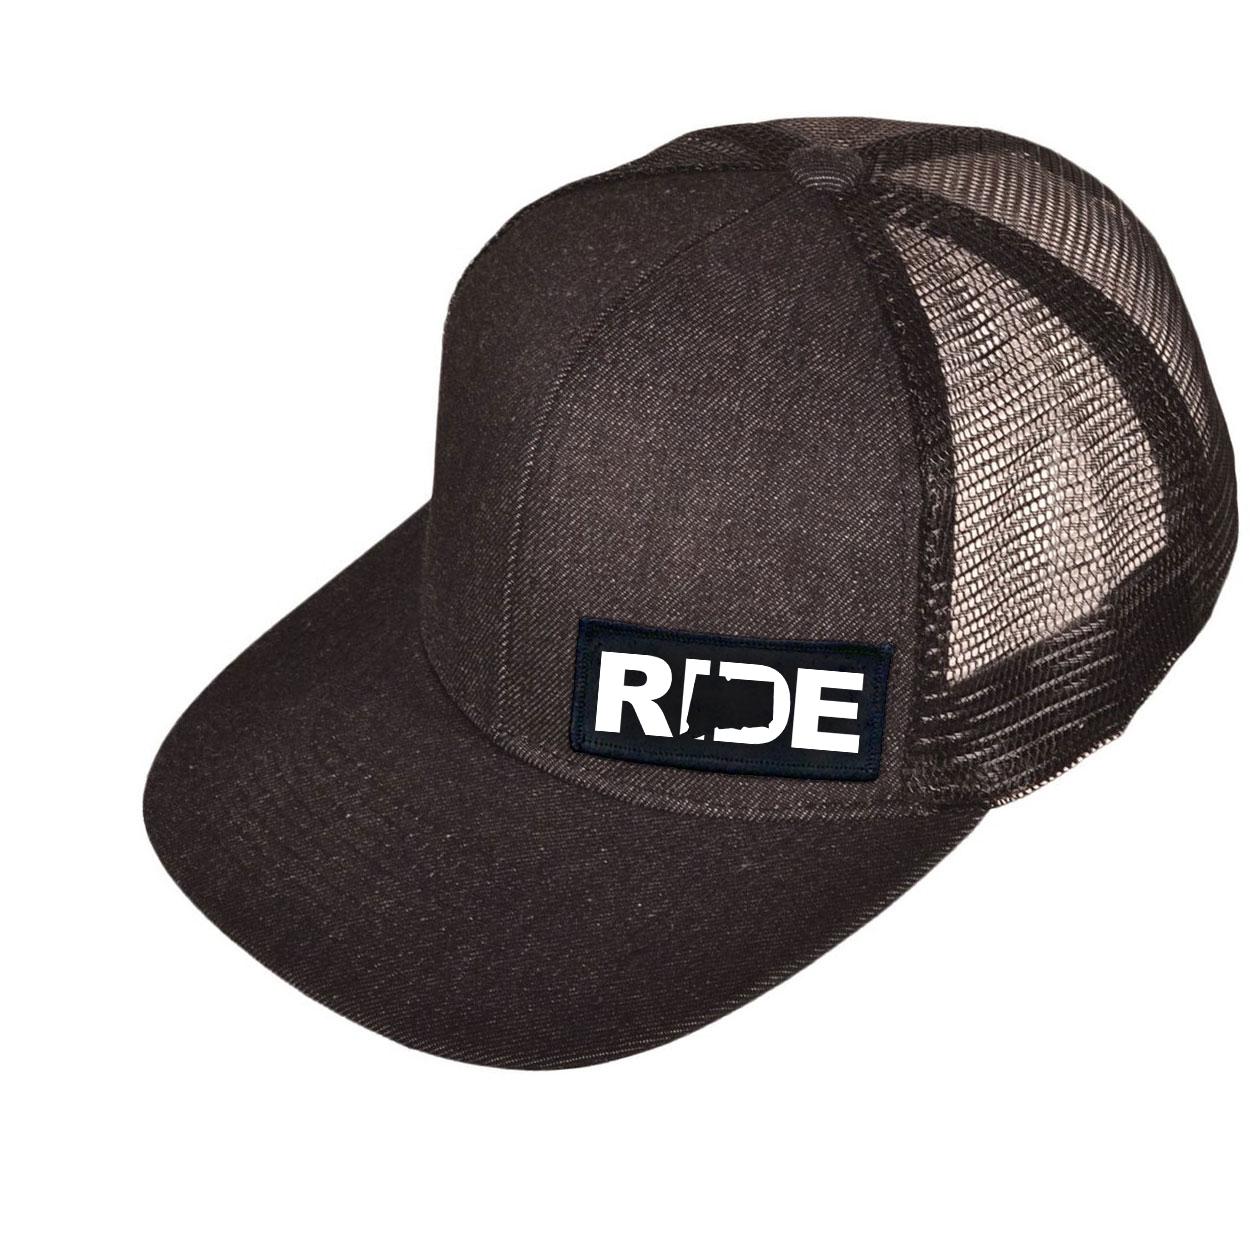 Ride Connecticut Night Out Woven Patch Snapback Flat Brim Hat Black Denim (White Logo)